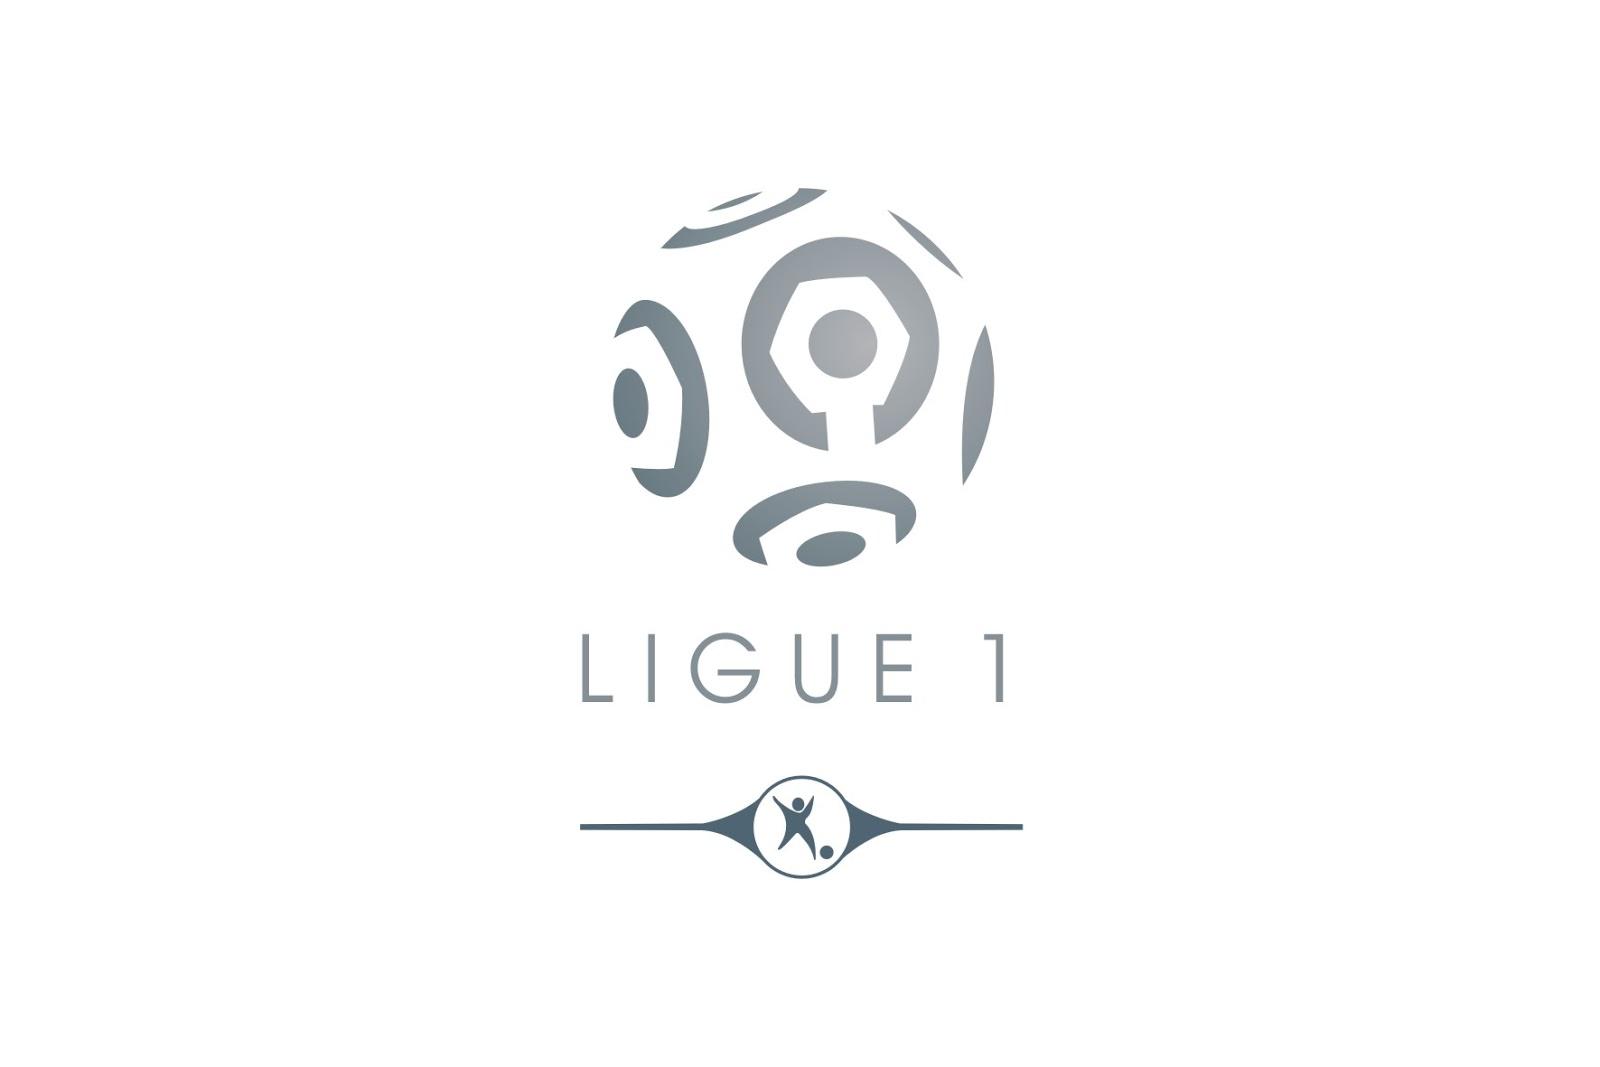 Hasil Bola Terkini: PSG vs Bastia, Ligue 1